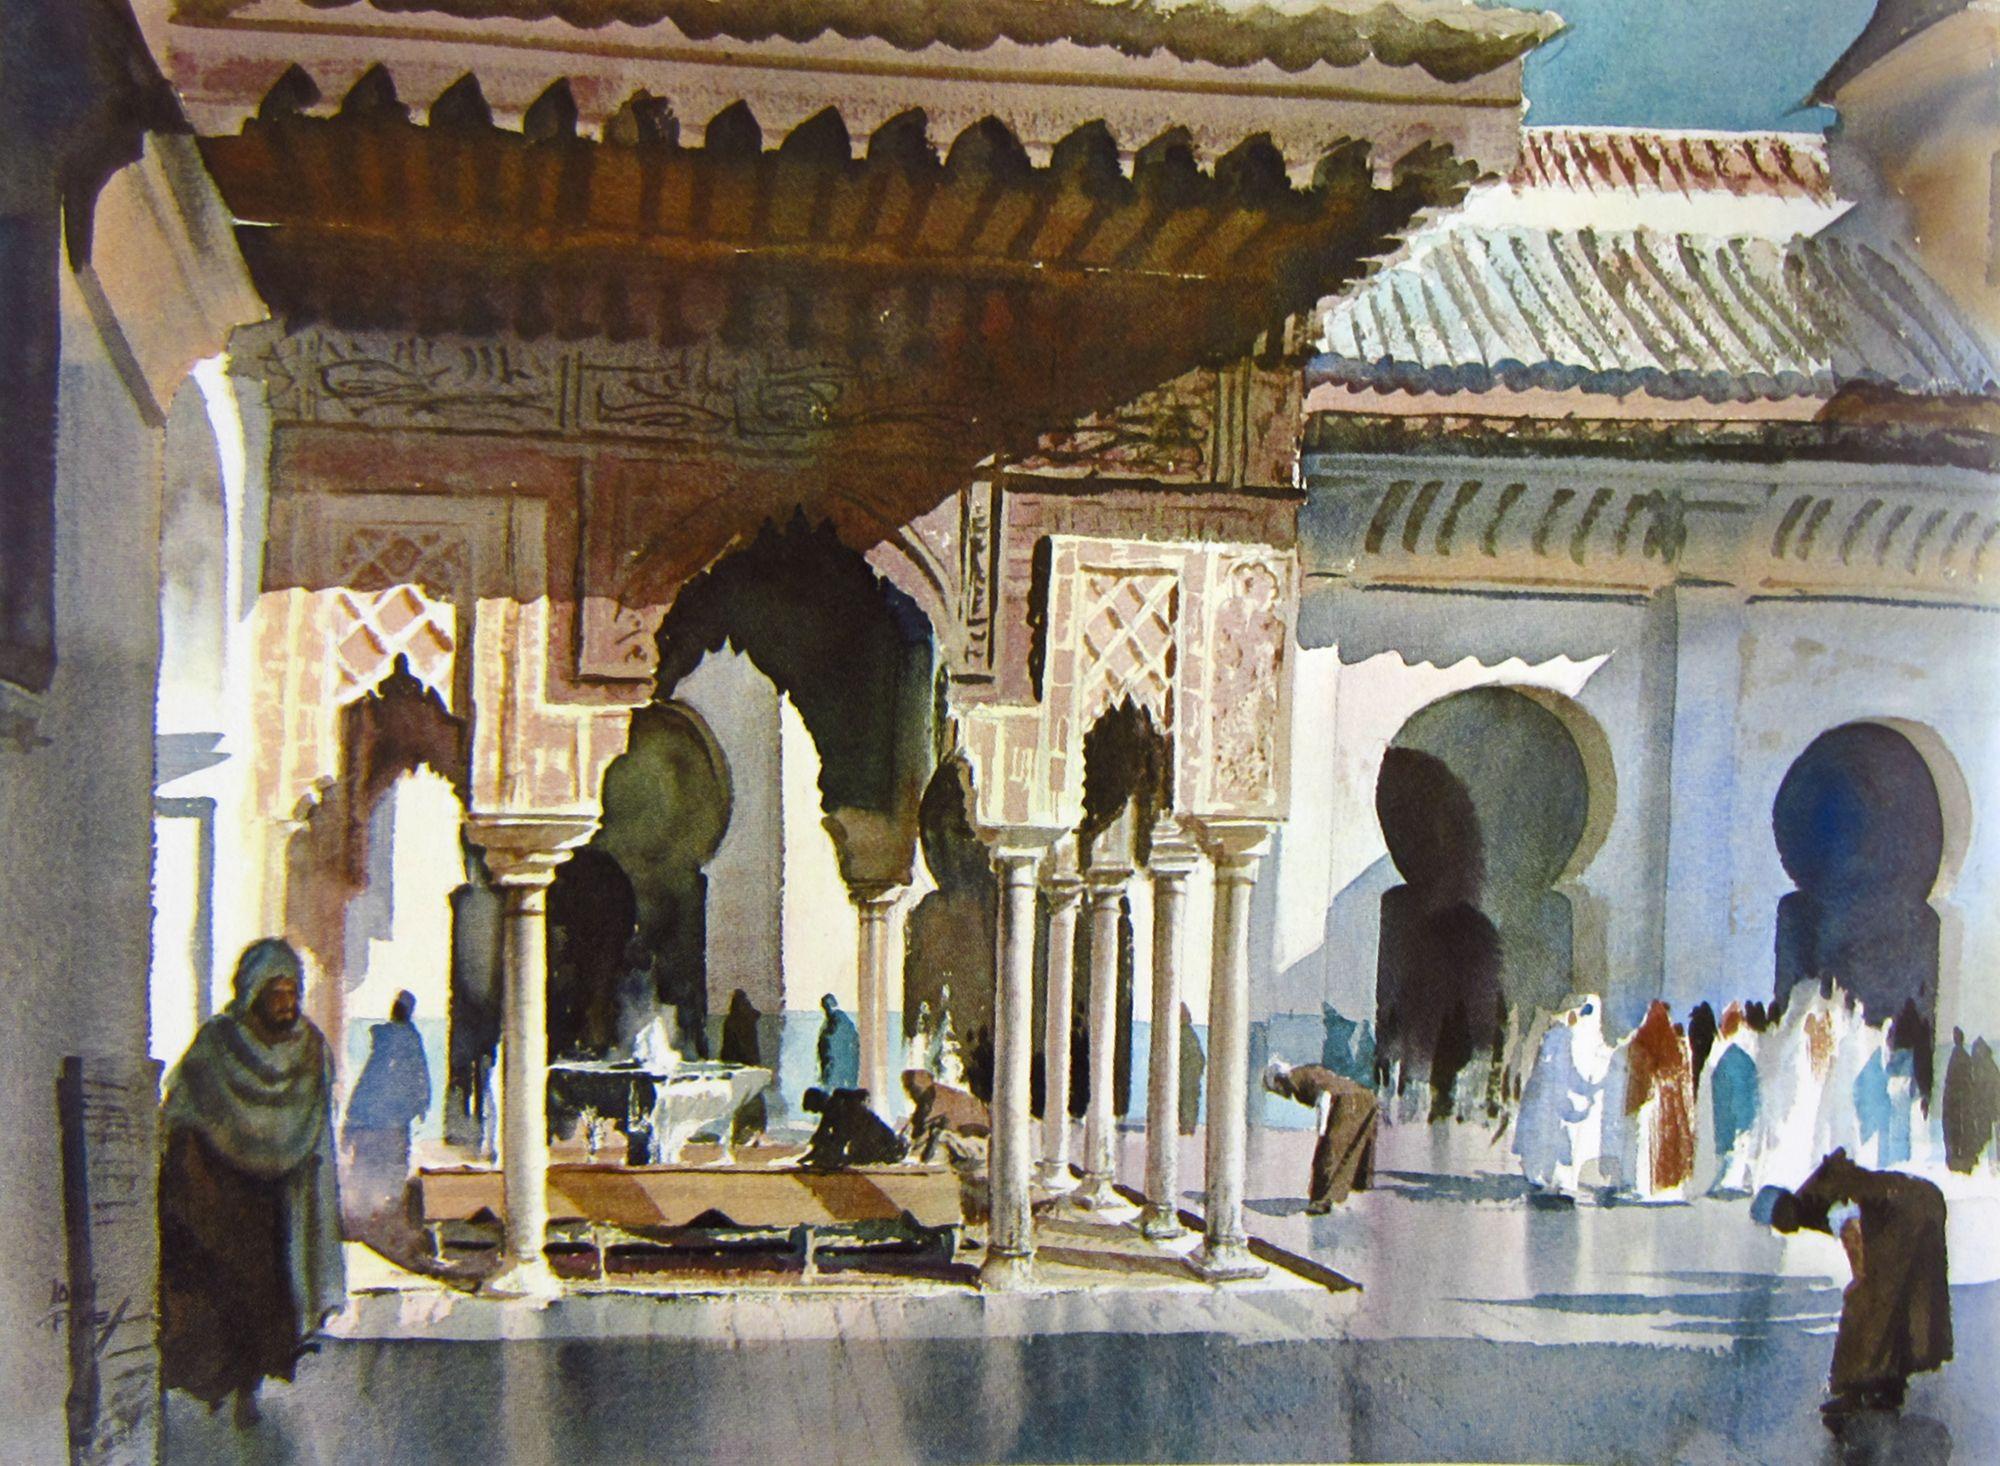 Watercolor art history - John Pike Watercolor Batik Artwatercolor Artcityscapesart History